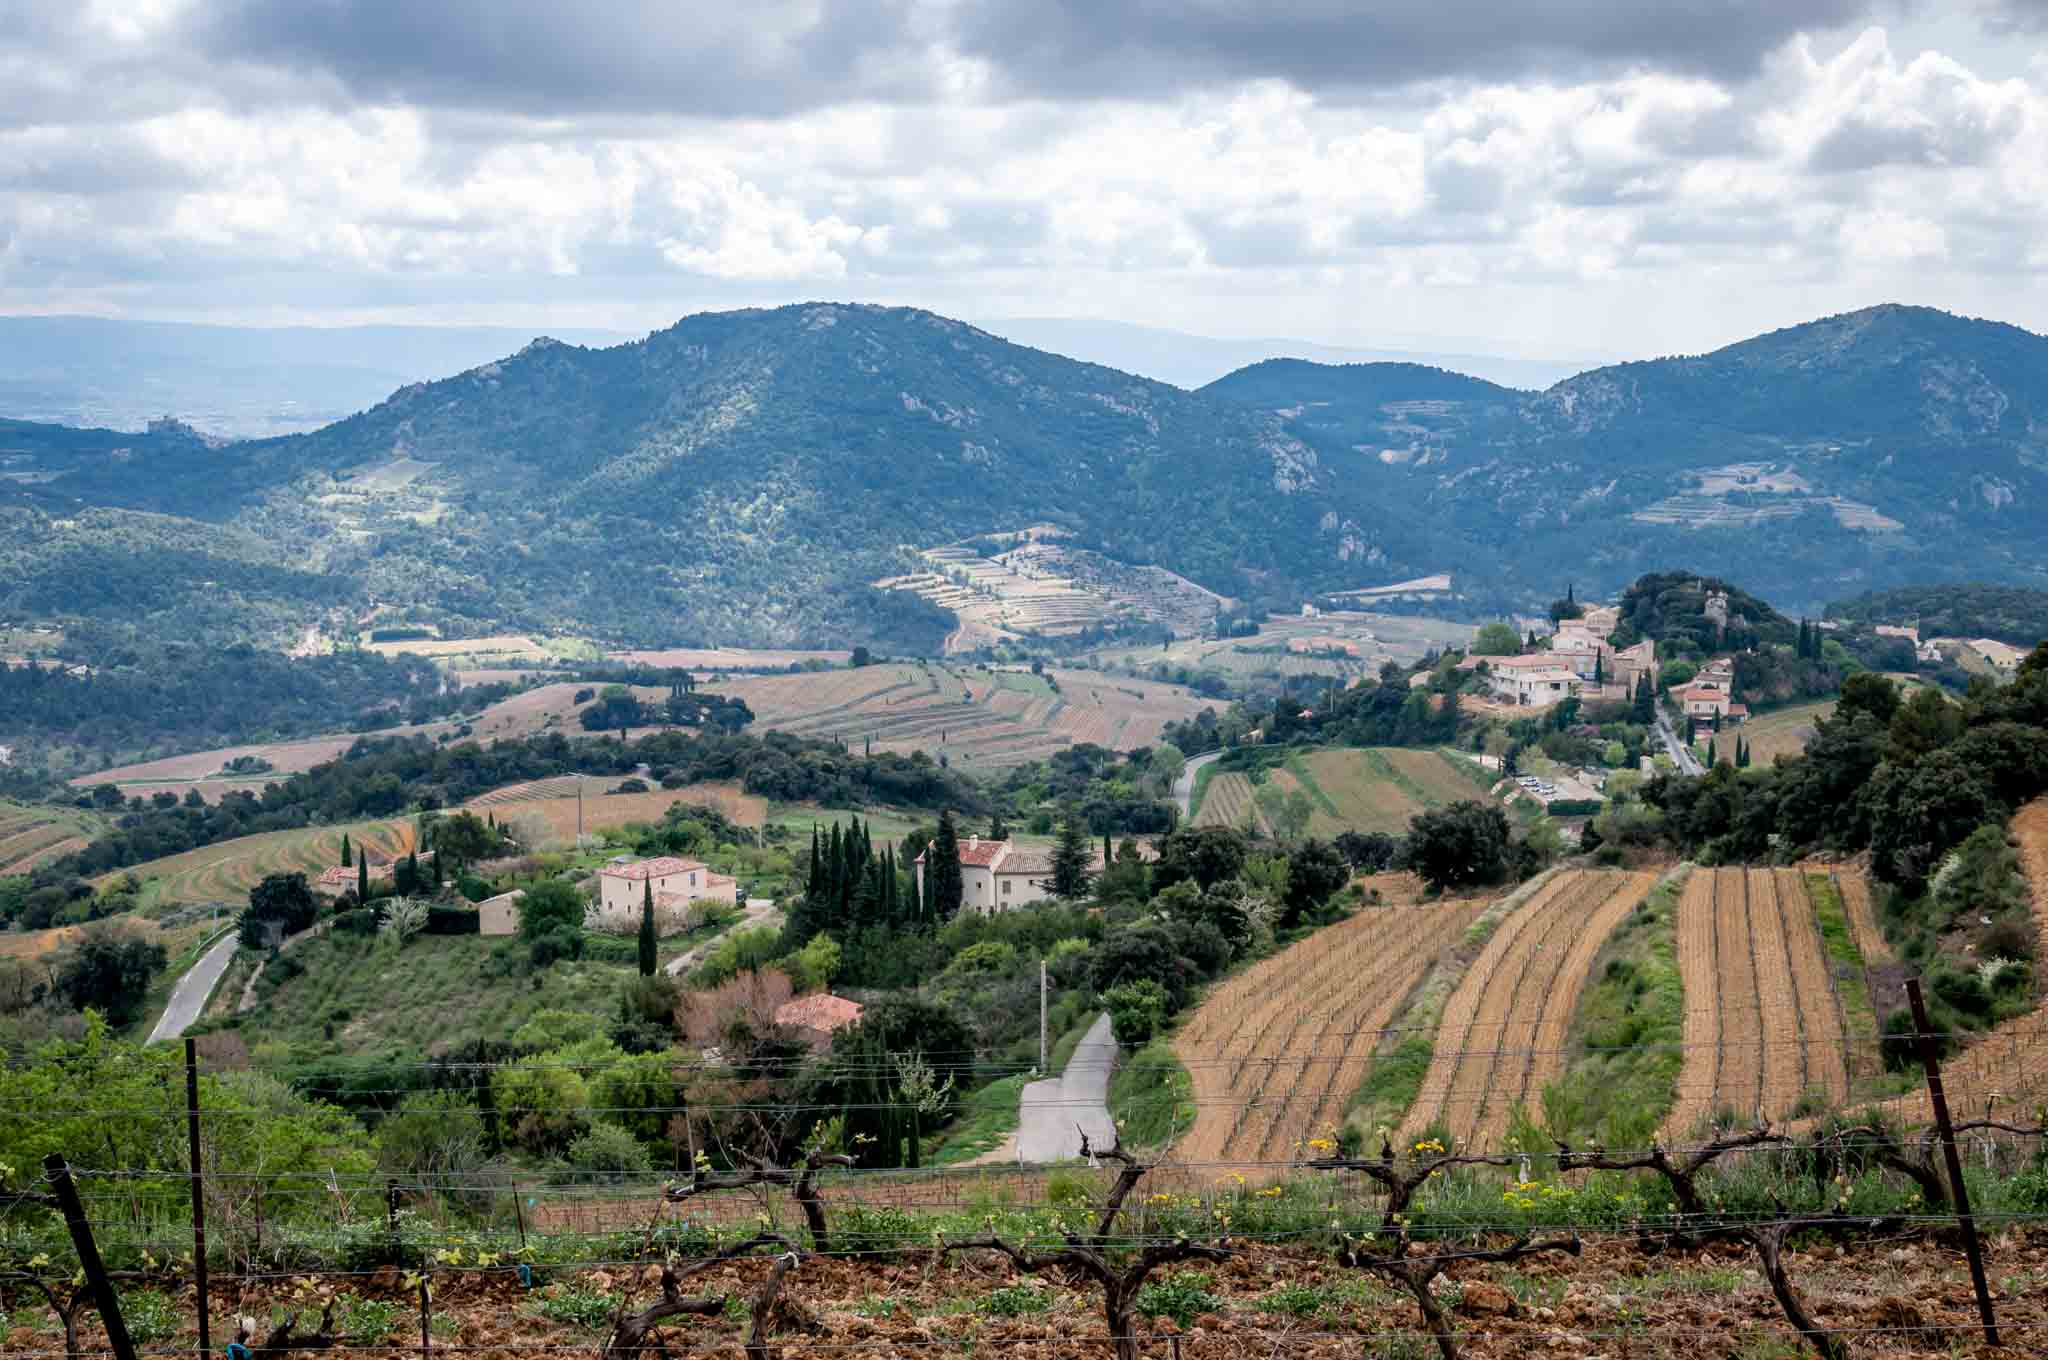 Mountains and Cotes du Rhone vineyards